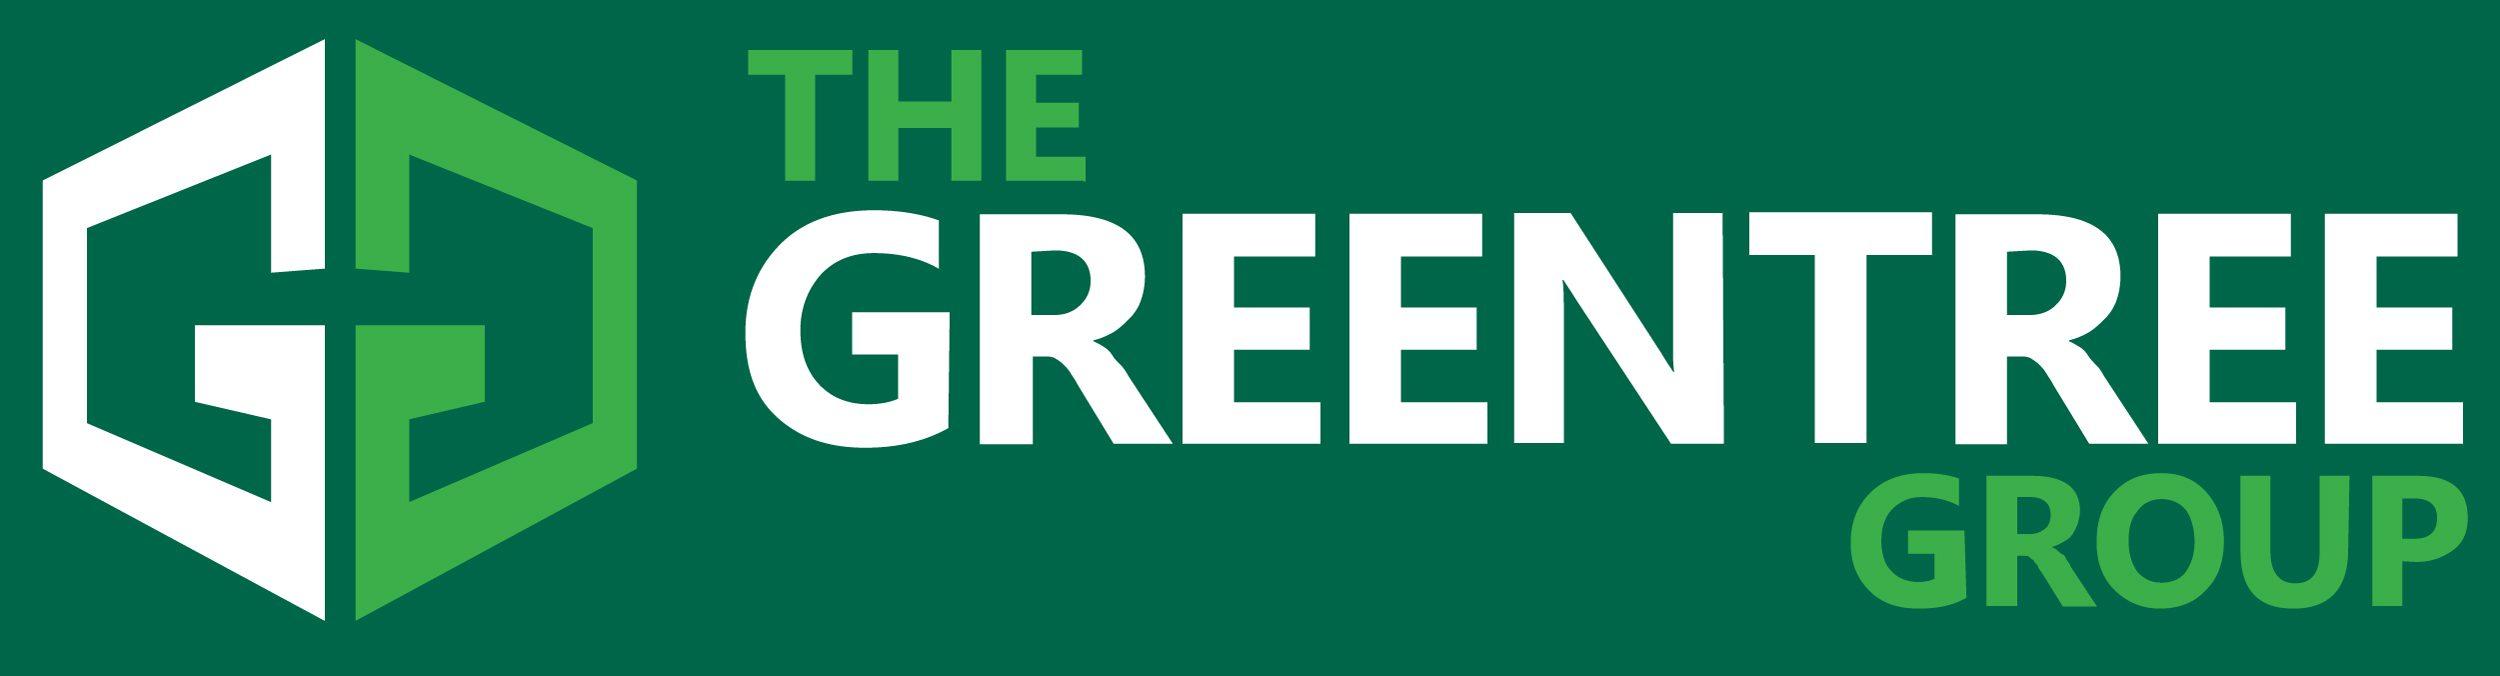 Greentree Group